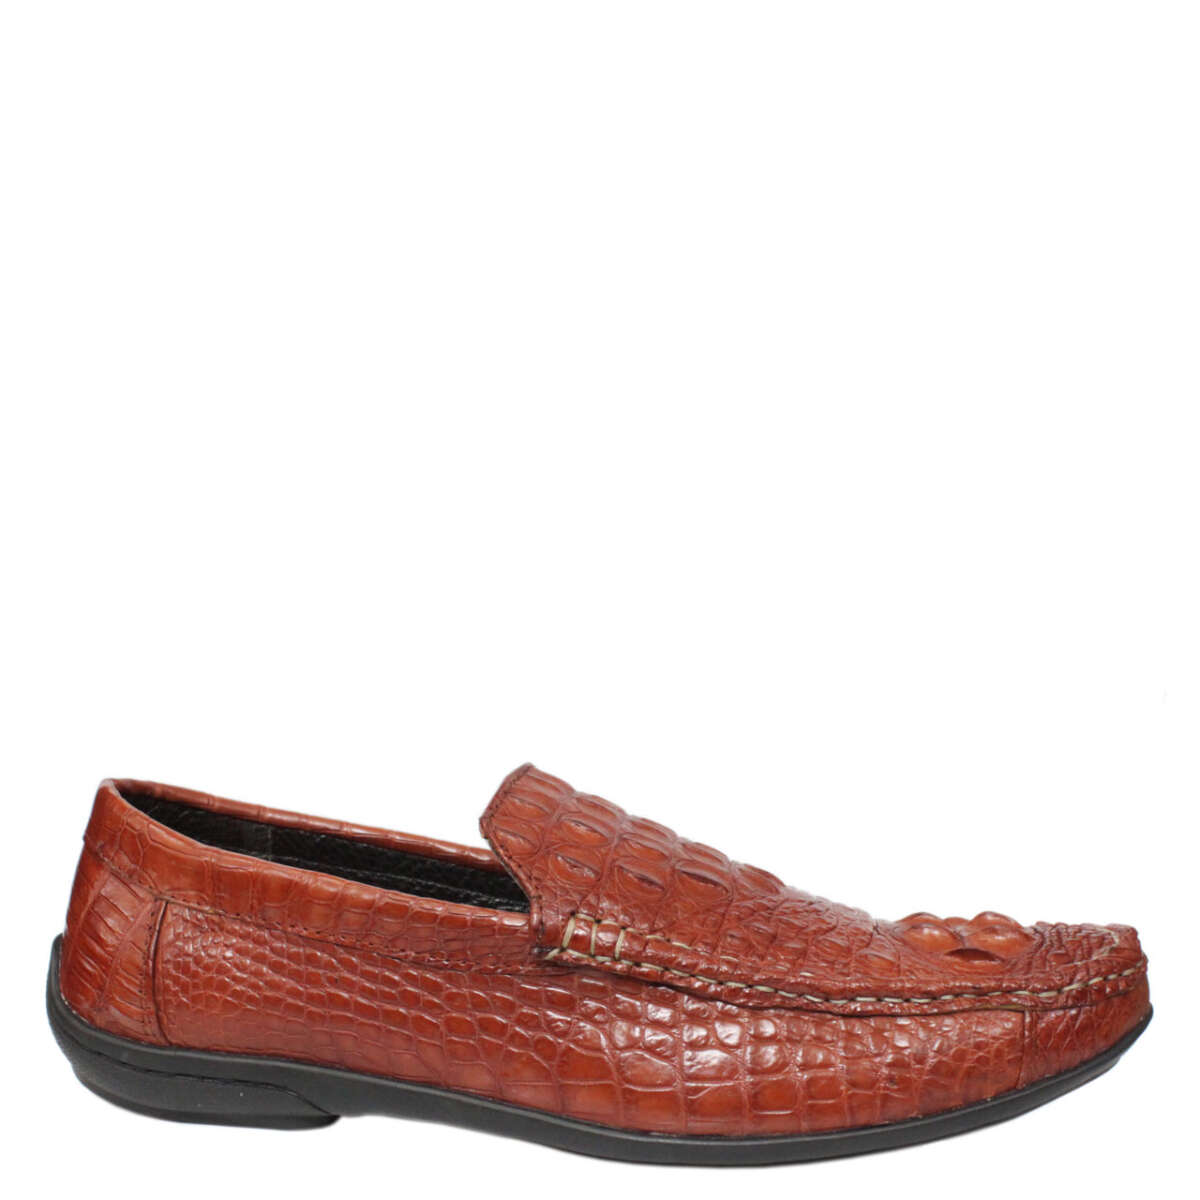 Giày lười nam da cá sấu S879a